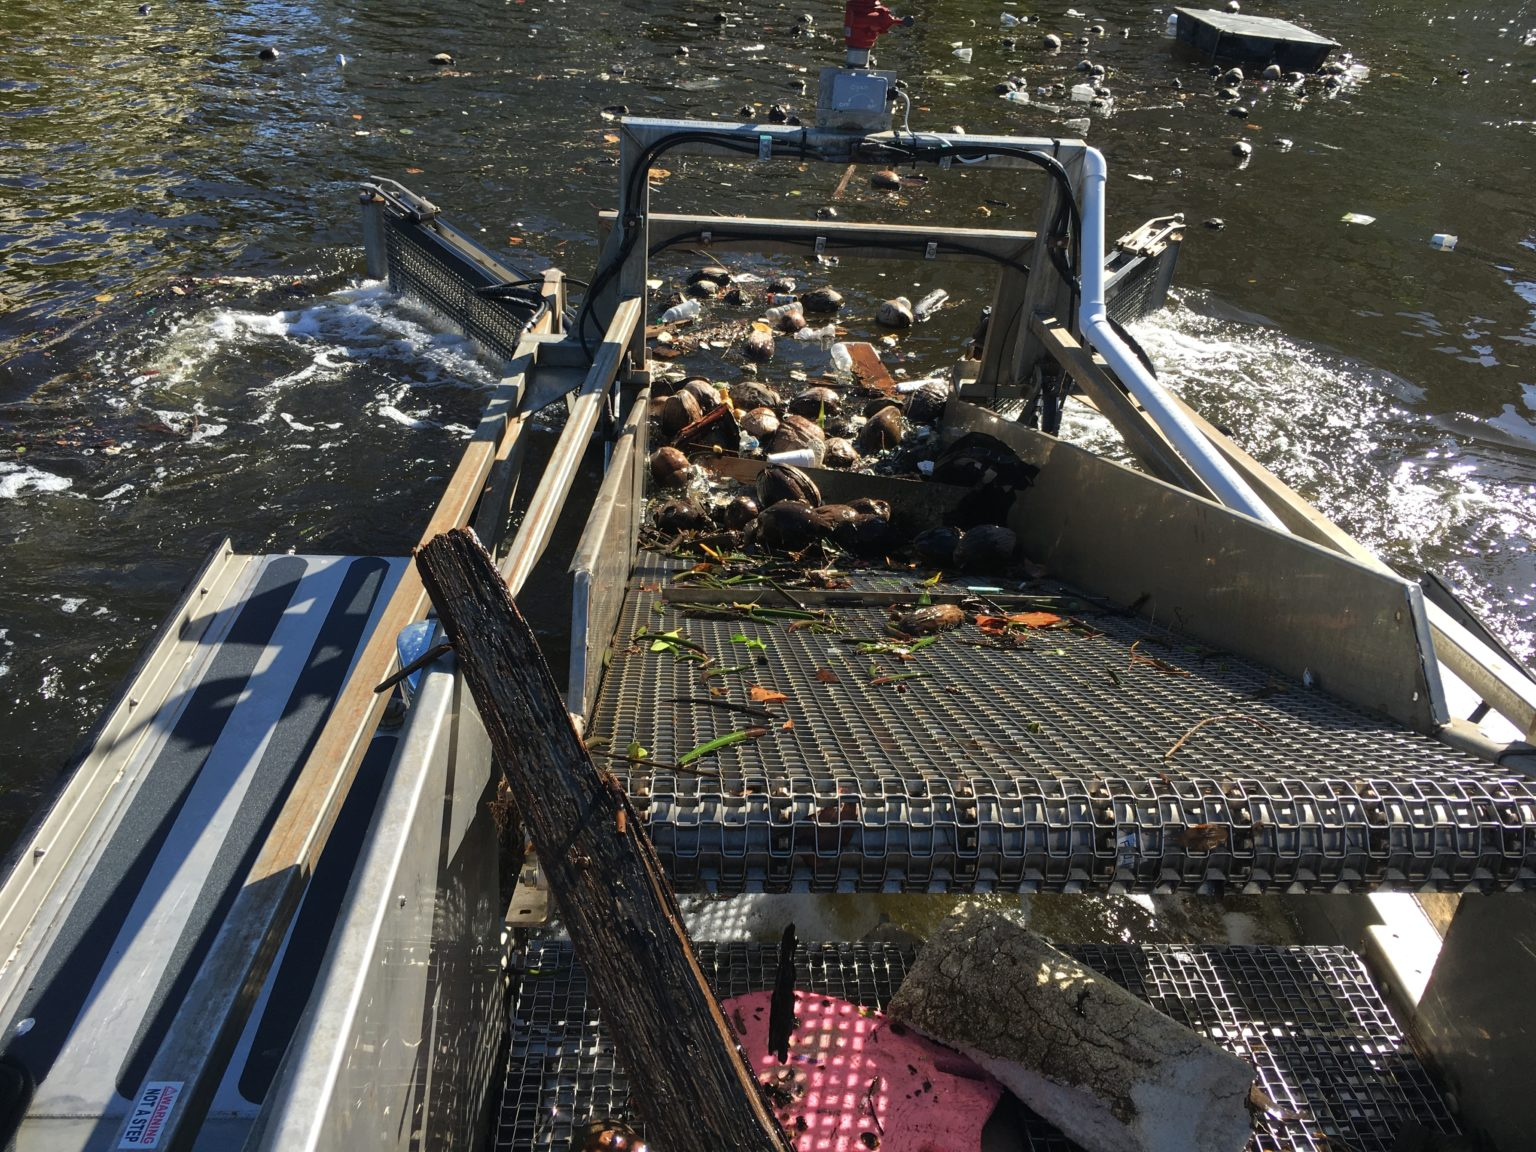 MC702 Trash Skimmer / Marina Cleaner